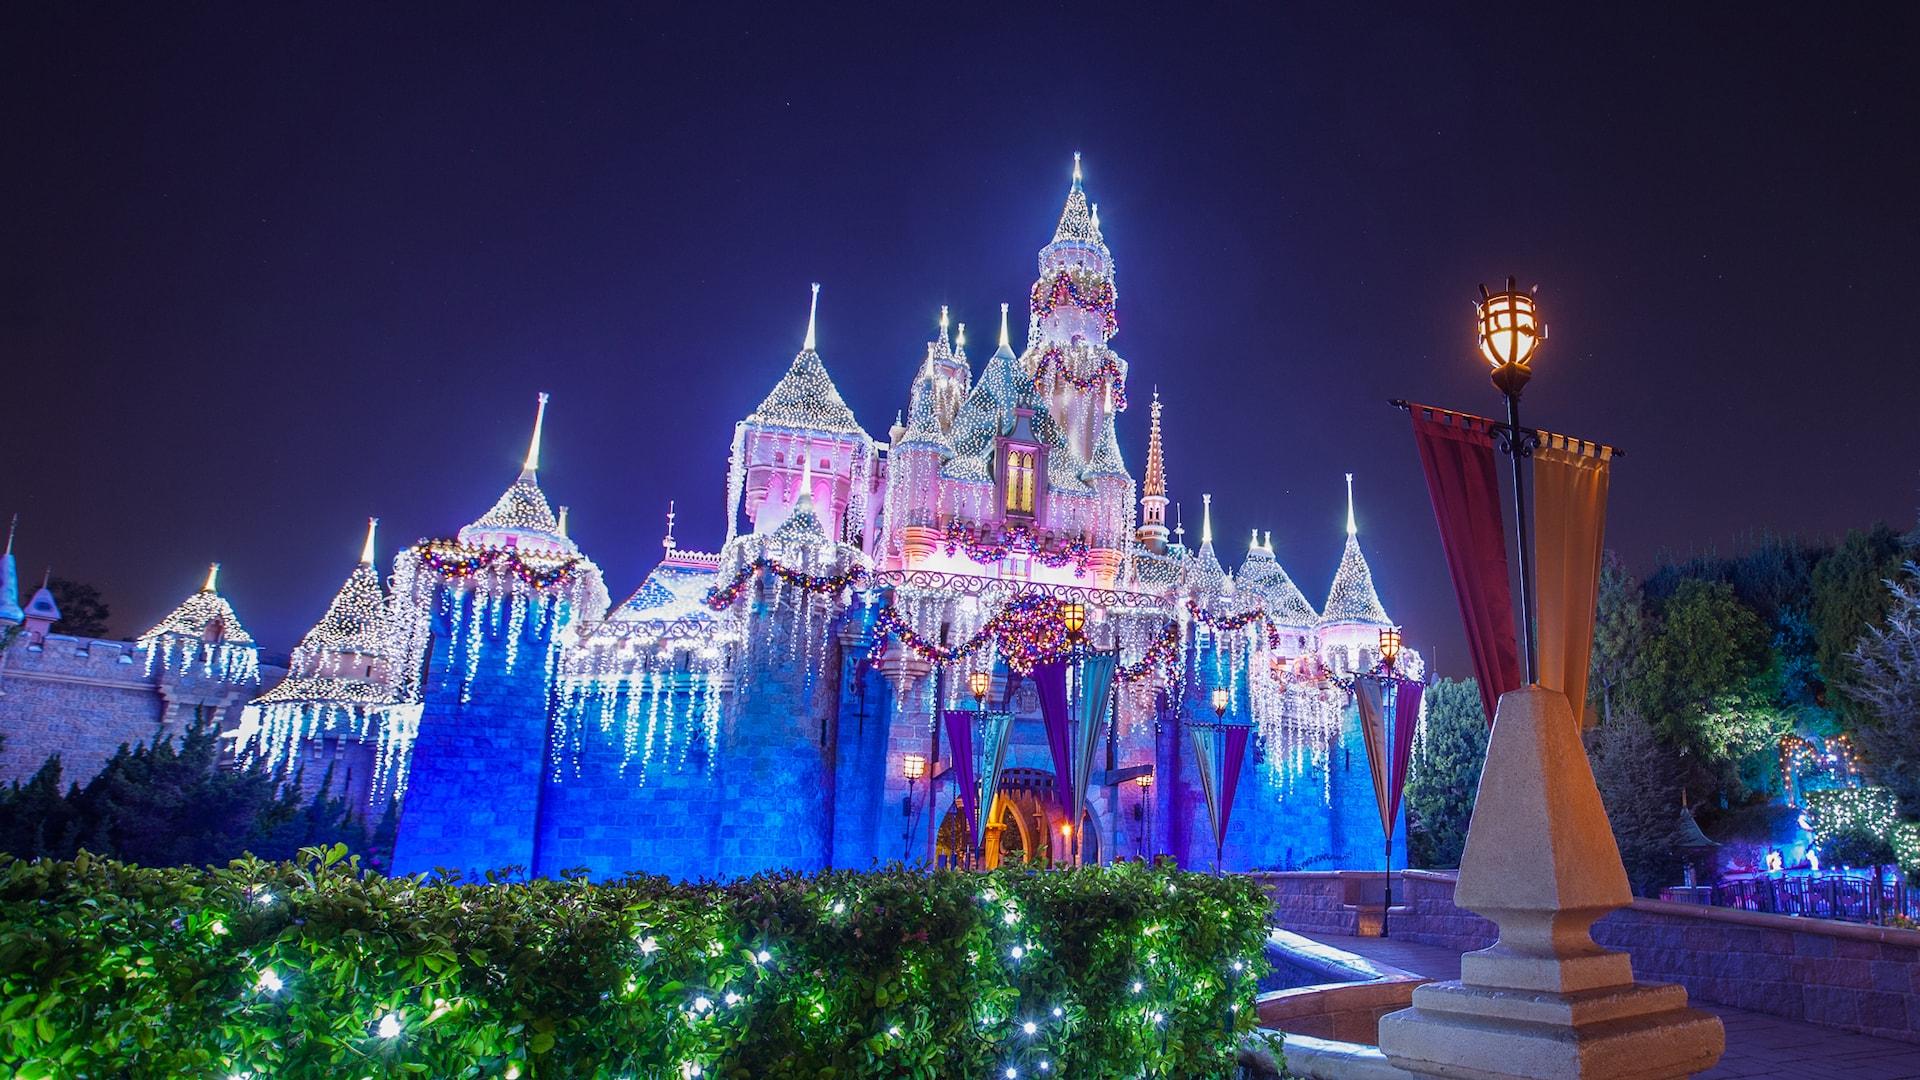 Christmas At Disneyland.Holiday Decor Christmas Lighting At Disneyland Resort